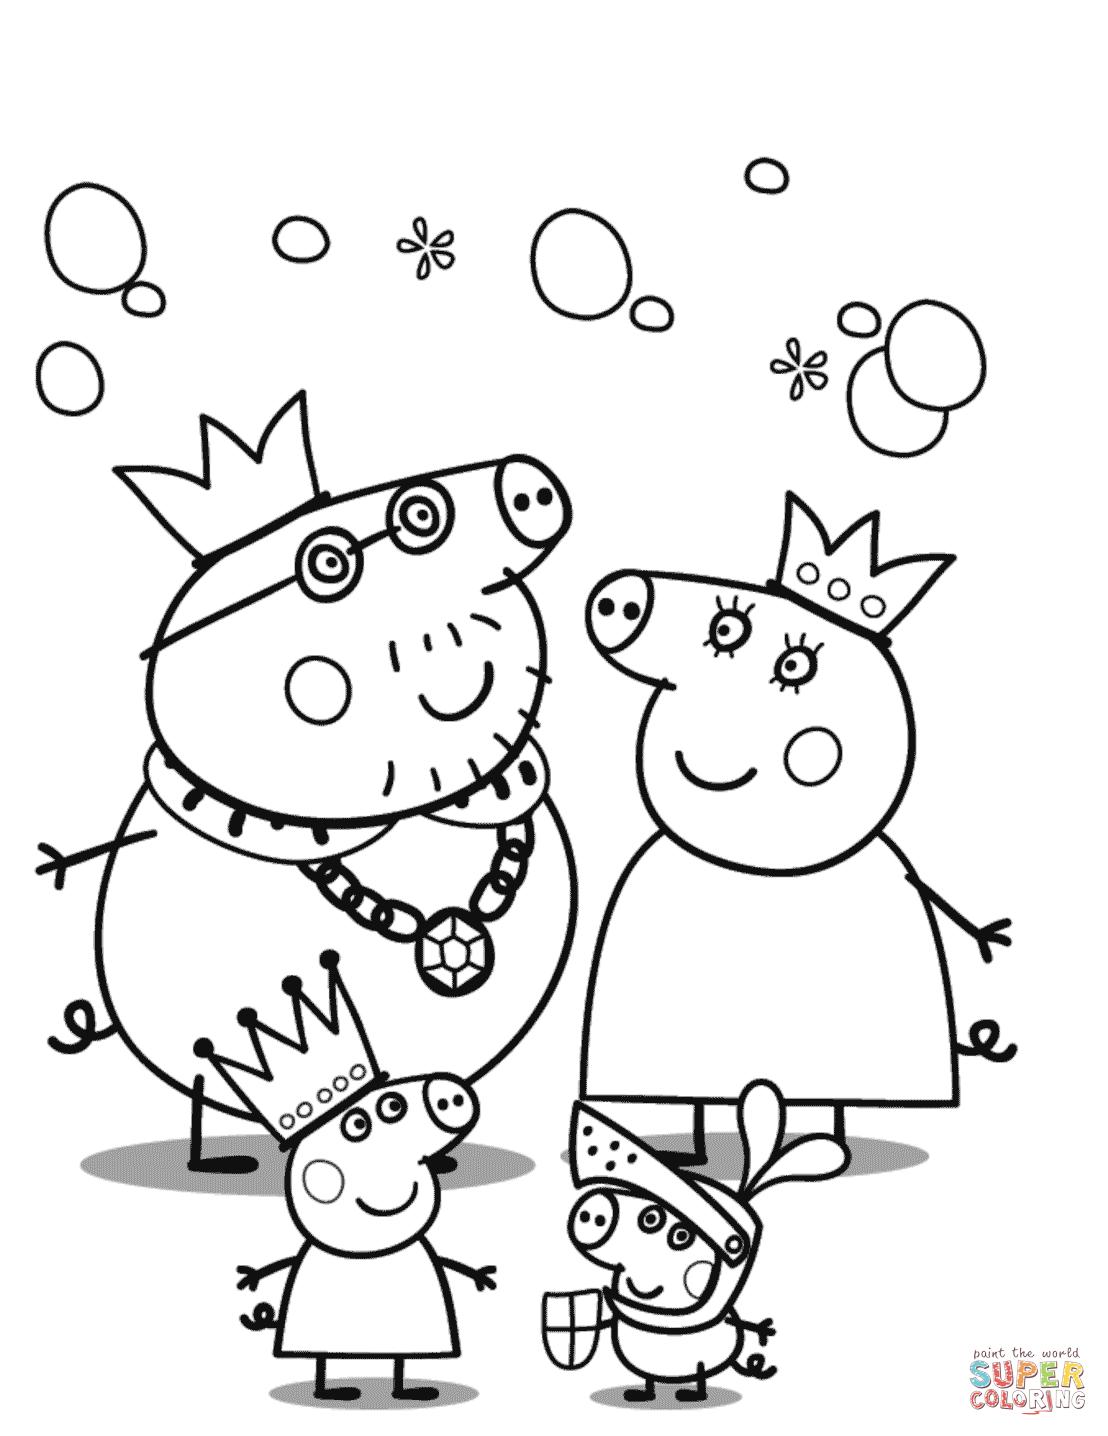 Peppa Pig S Royal Family Coloring Page